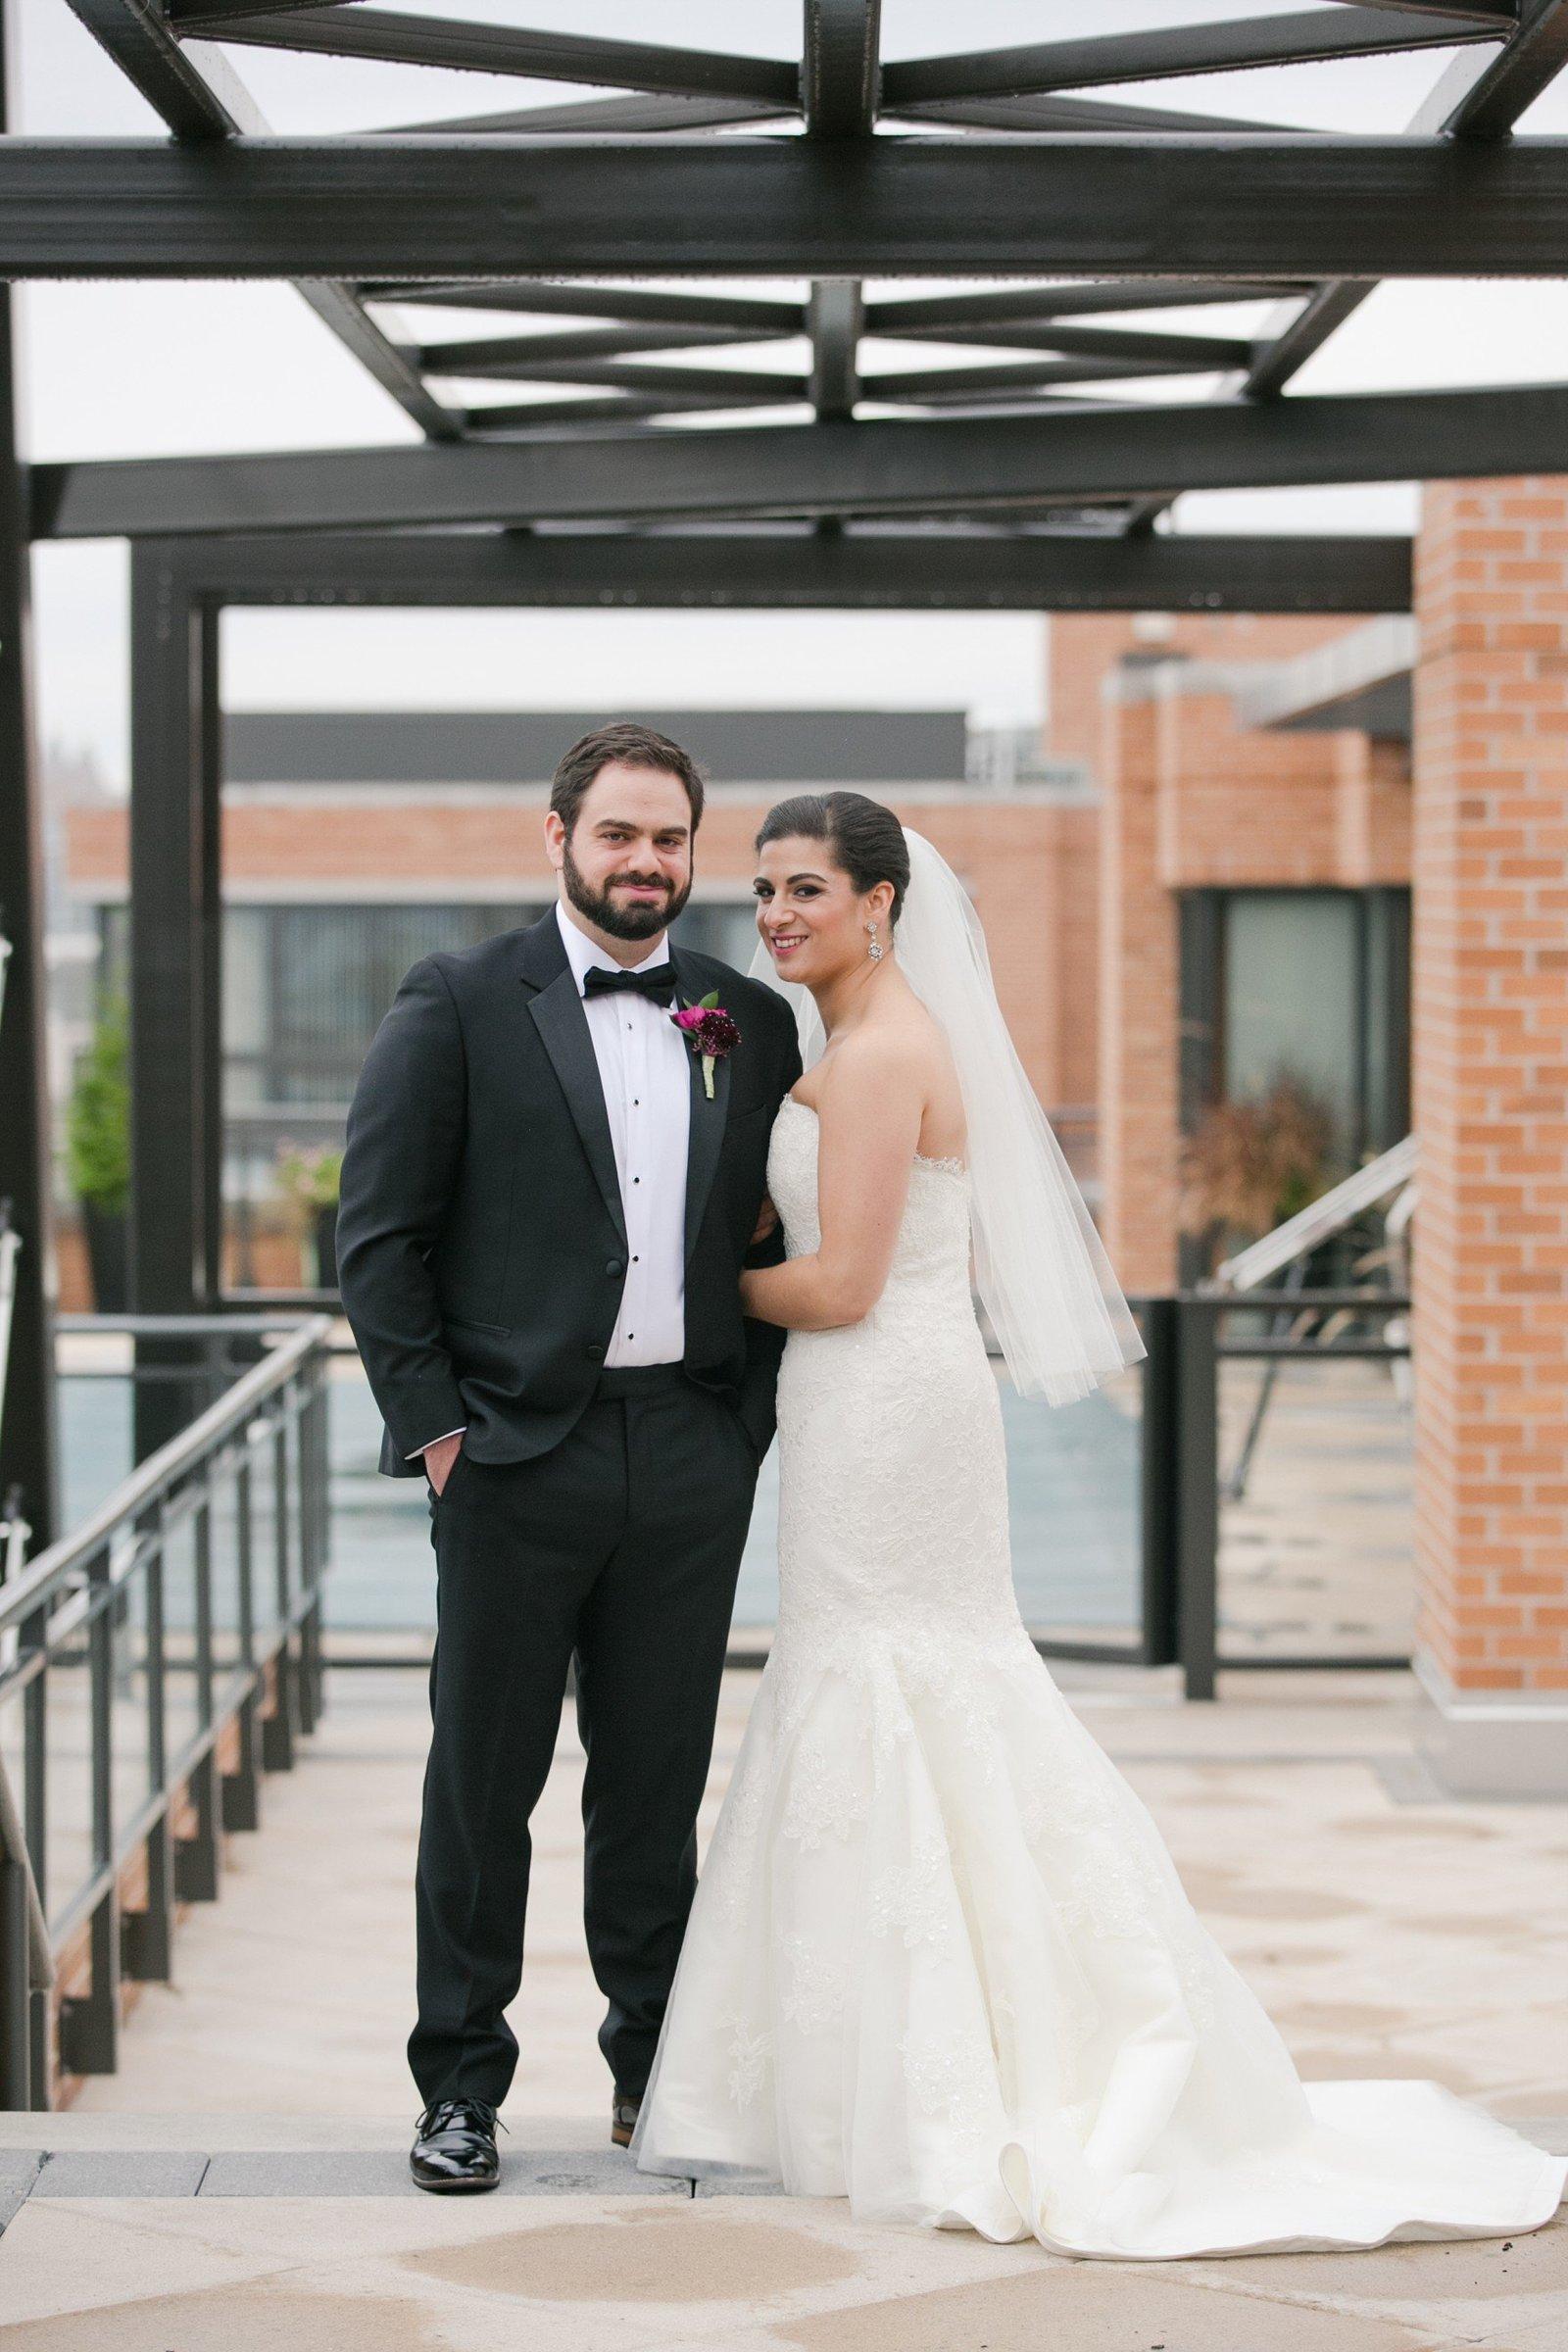 Black-tie-wedding-photos-longview-gallery-dc (142)